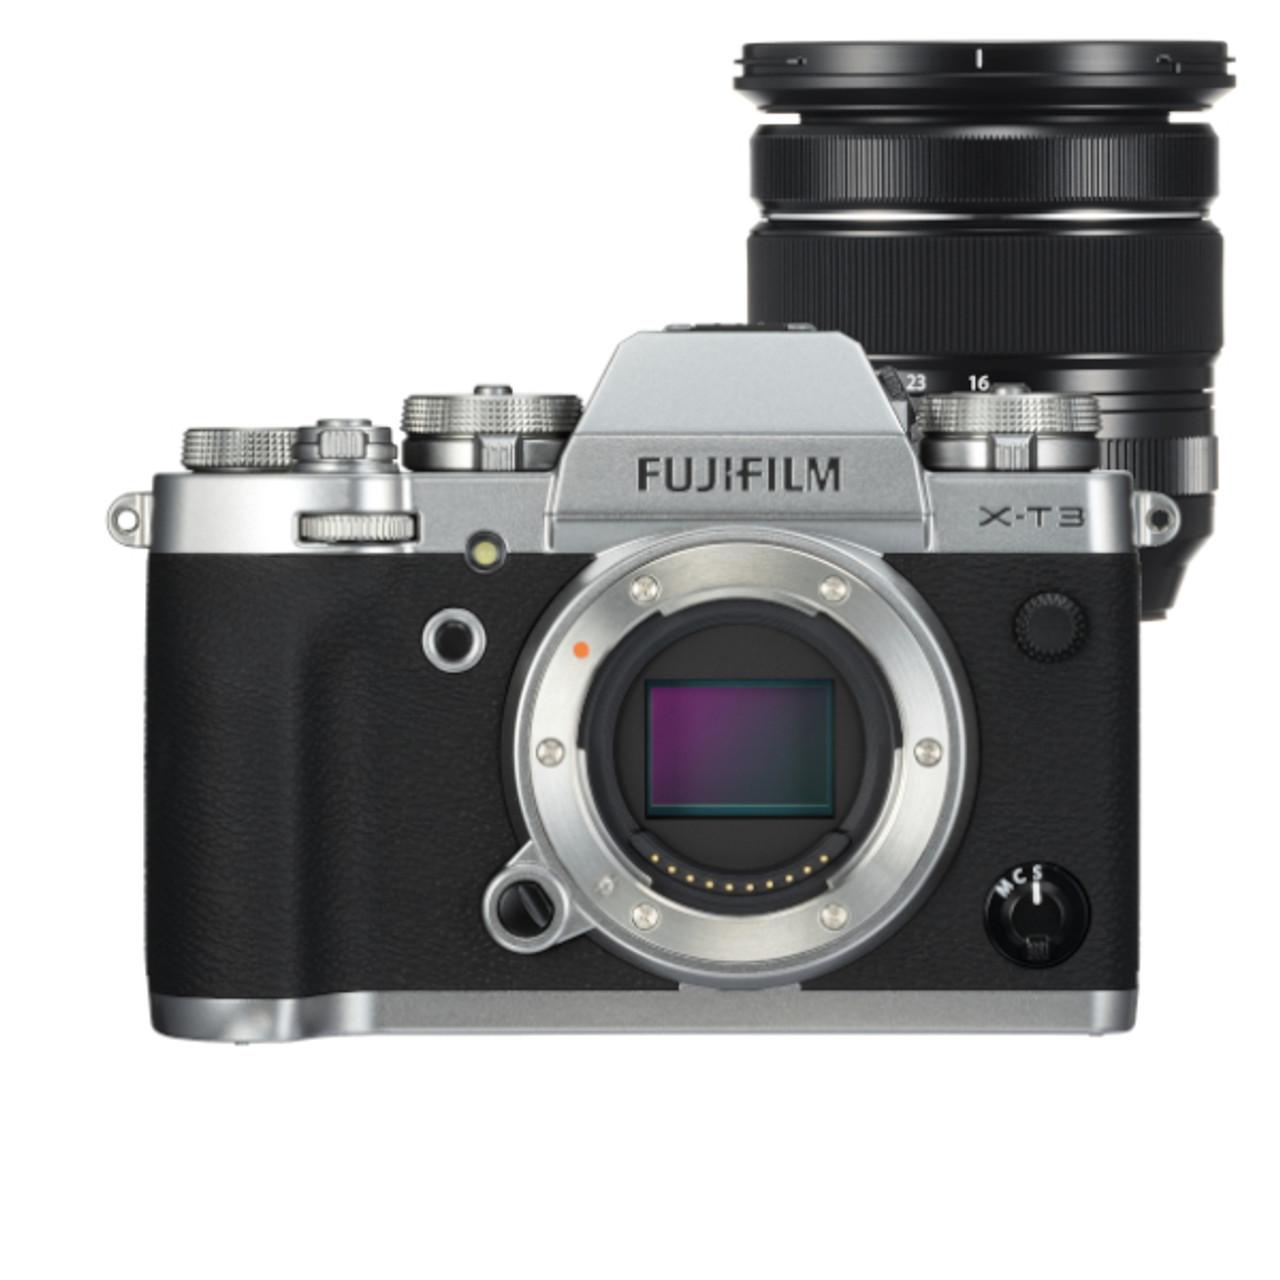 Fujifilm X-T3 Body w/ XF16-80mm F4 R OIS WR Lens Kit (Silver)